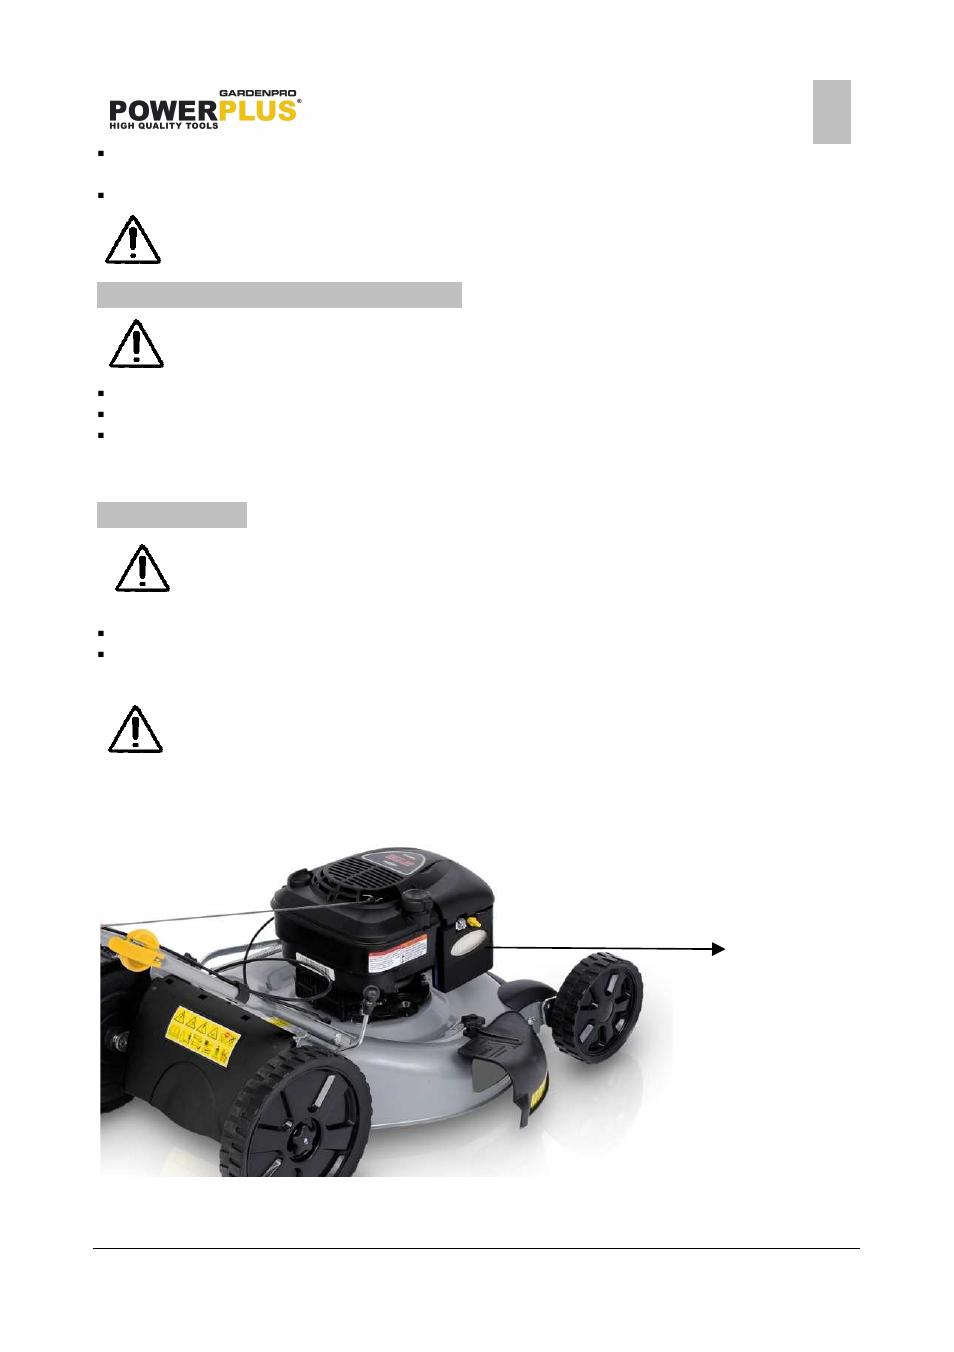 Powerplus POWXG6011 LAWNMOWER 190CC 550MM EN User Manual   Page 11 / 16